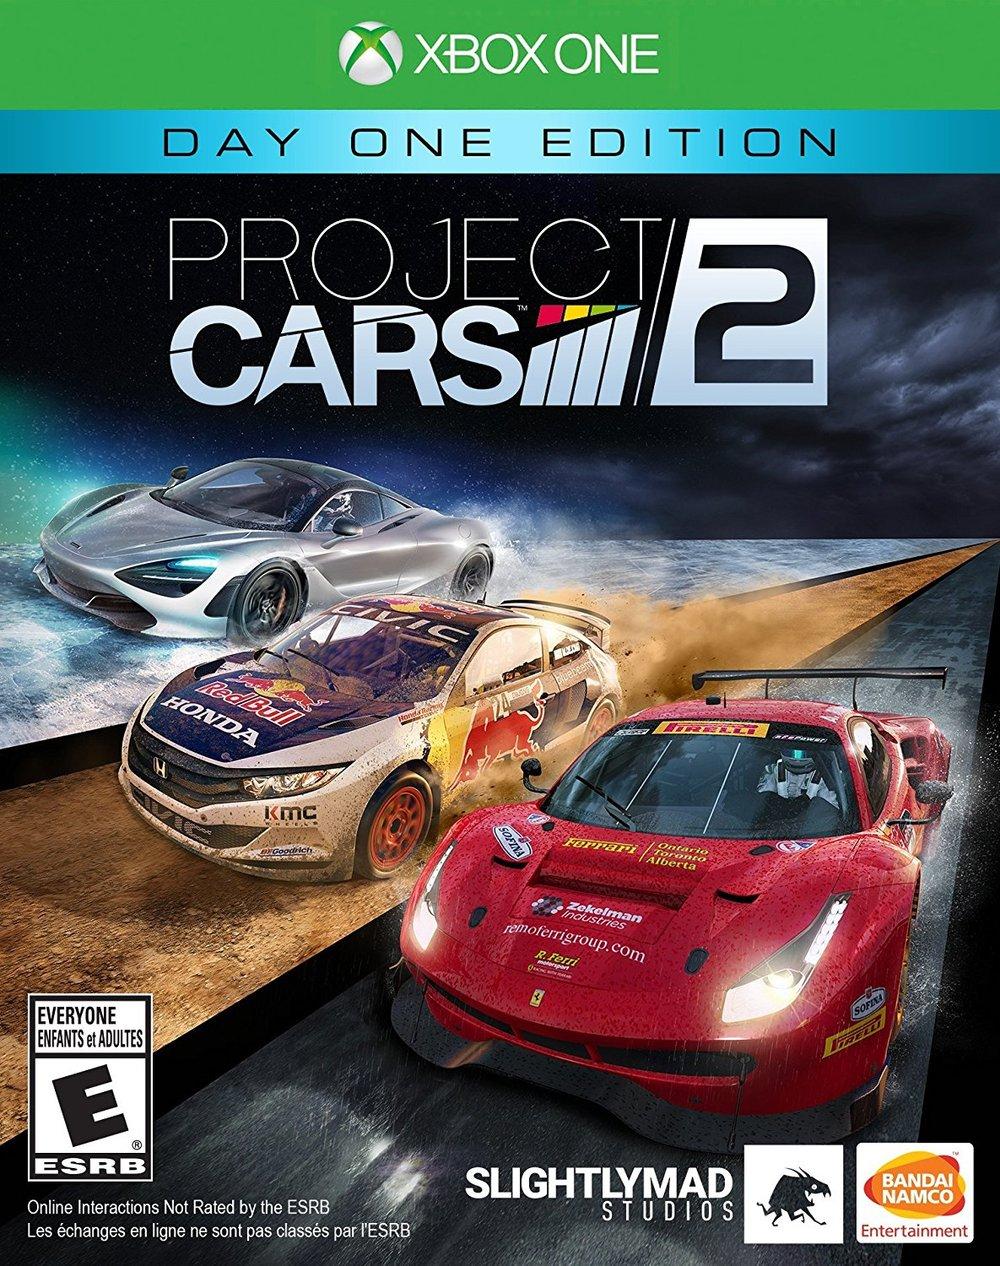 Box Cover - Xbox One.jpg